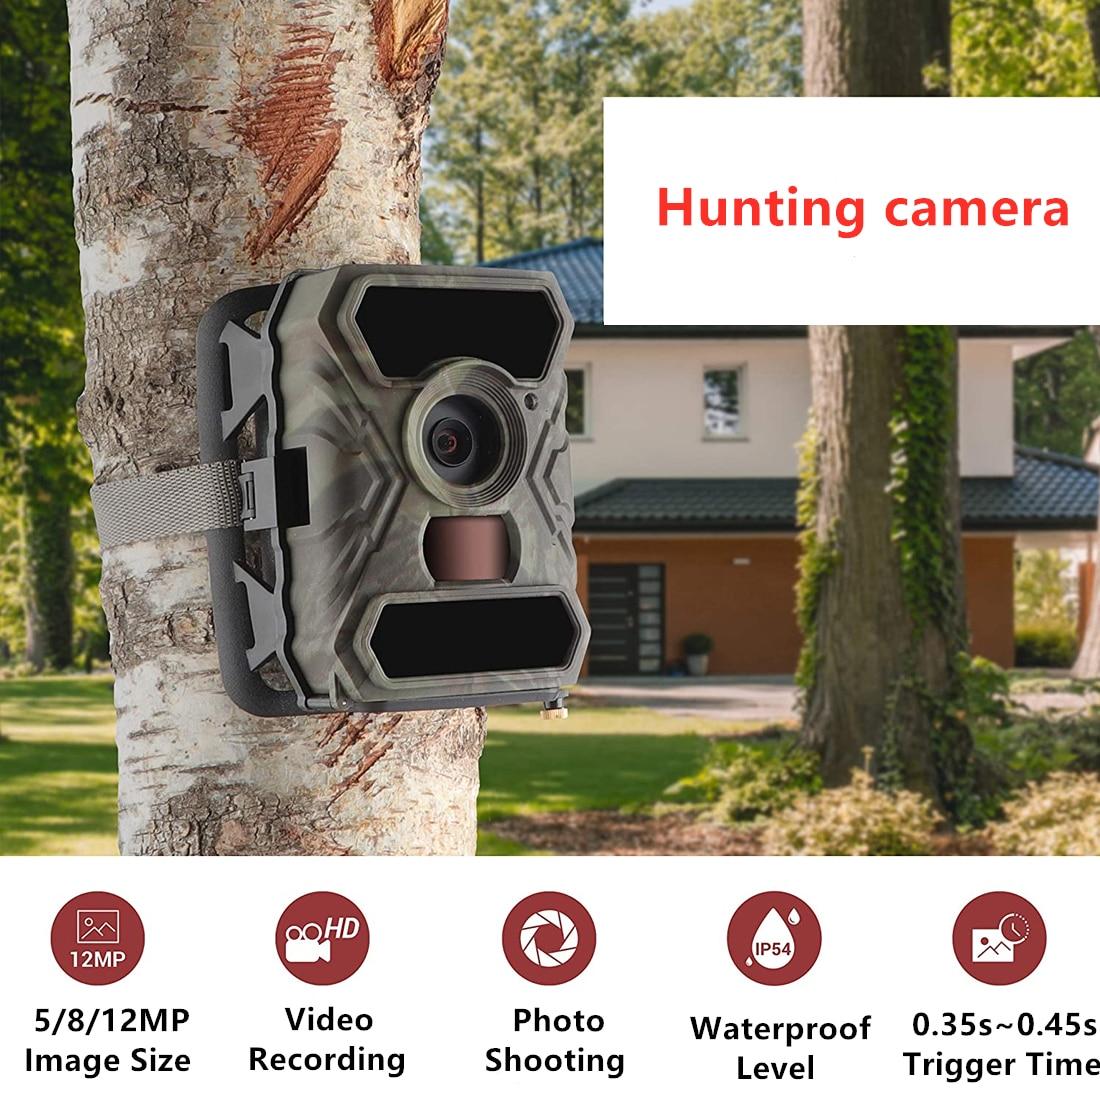 Cámara de caza S880G Trail Hunting Cámara 12MP 1080P Wild cámara de vigilancia IR visión nocturna cámaras de Scouting Wildlife